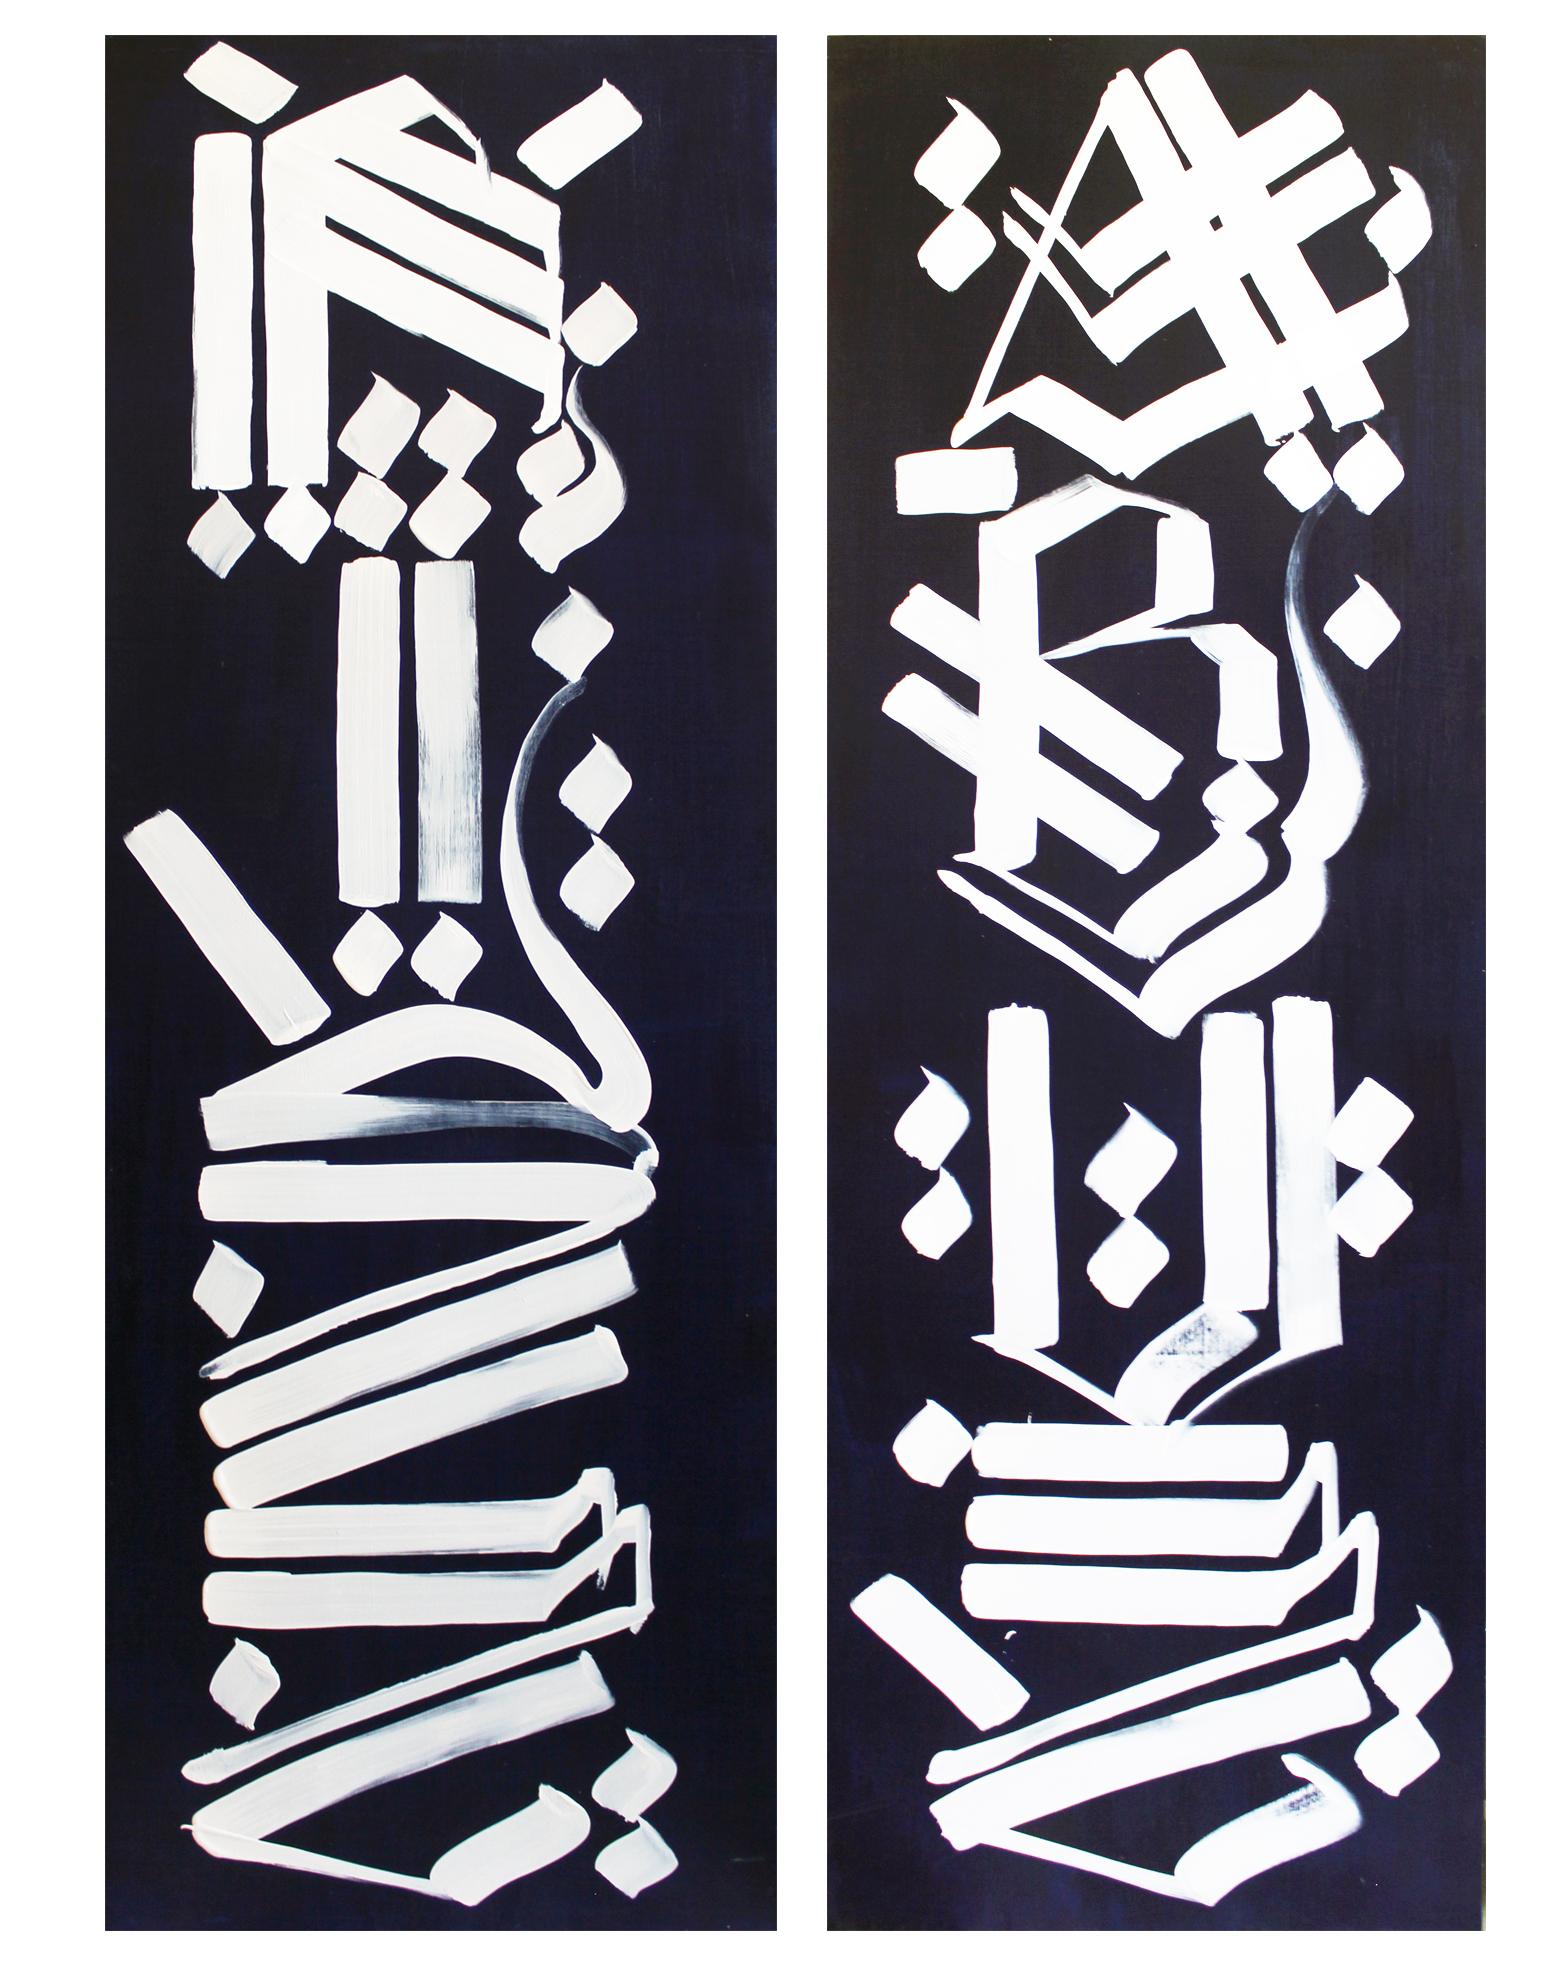 RETNA (Born 1979)   RISE ABOVE , 2008 Diptych acrylic on panel Each panel signed 2 x 6 feet, each; 4 x 6 feet overall Estimate: $15,000/$20,000